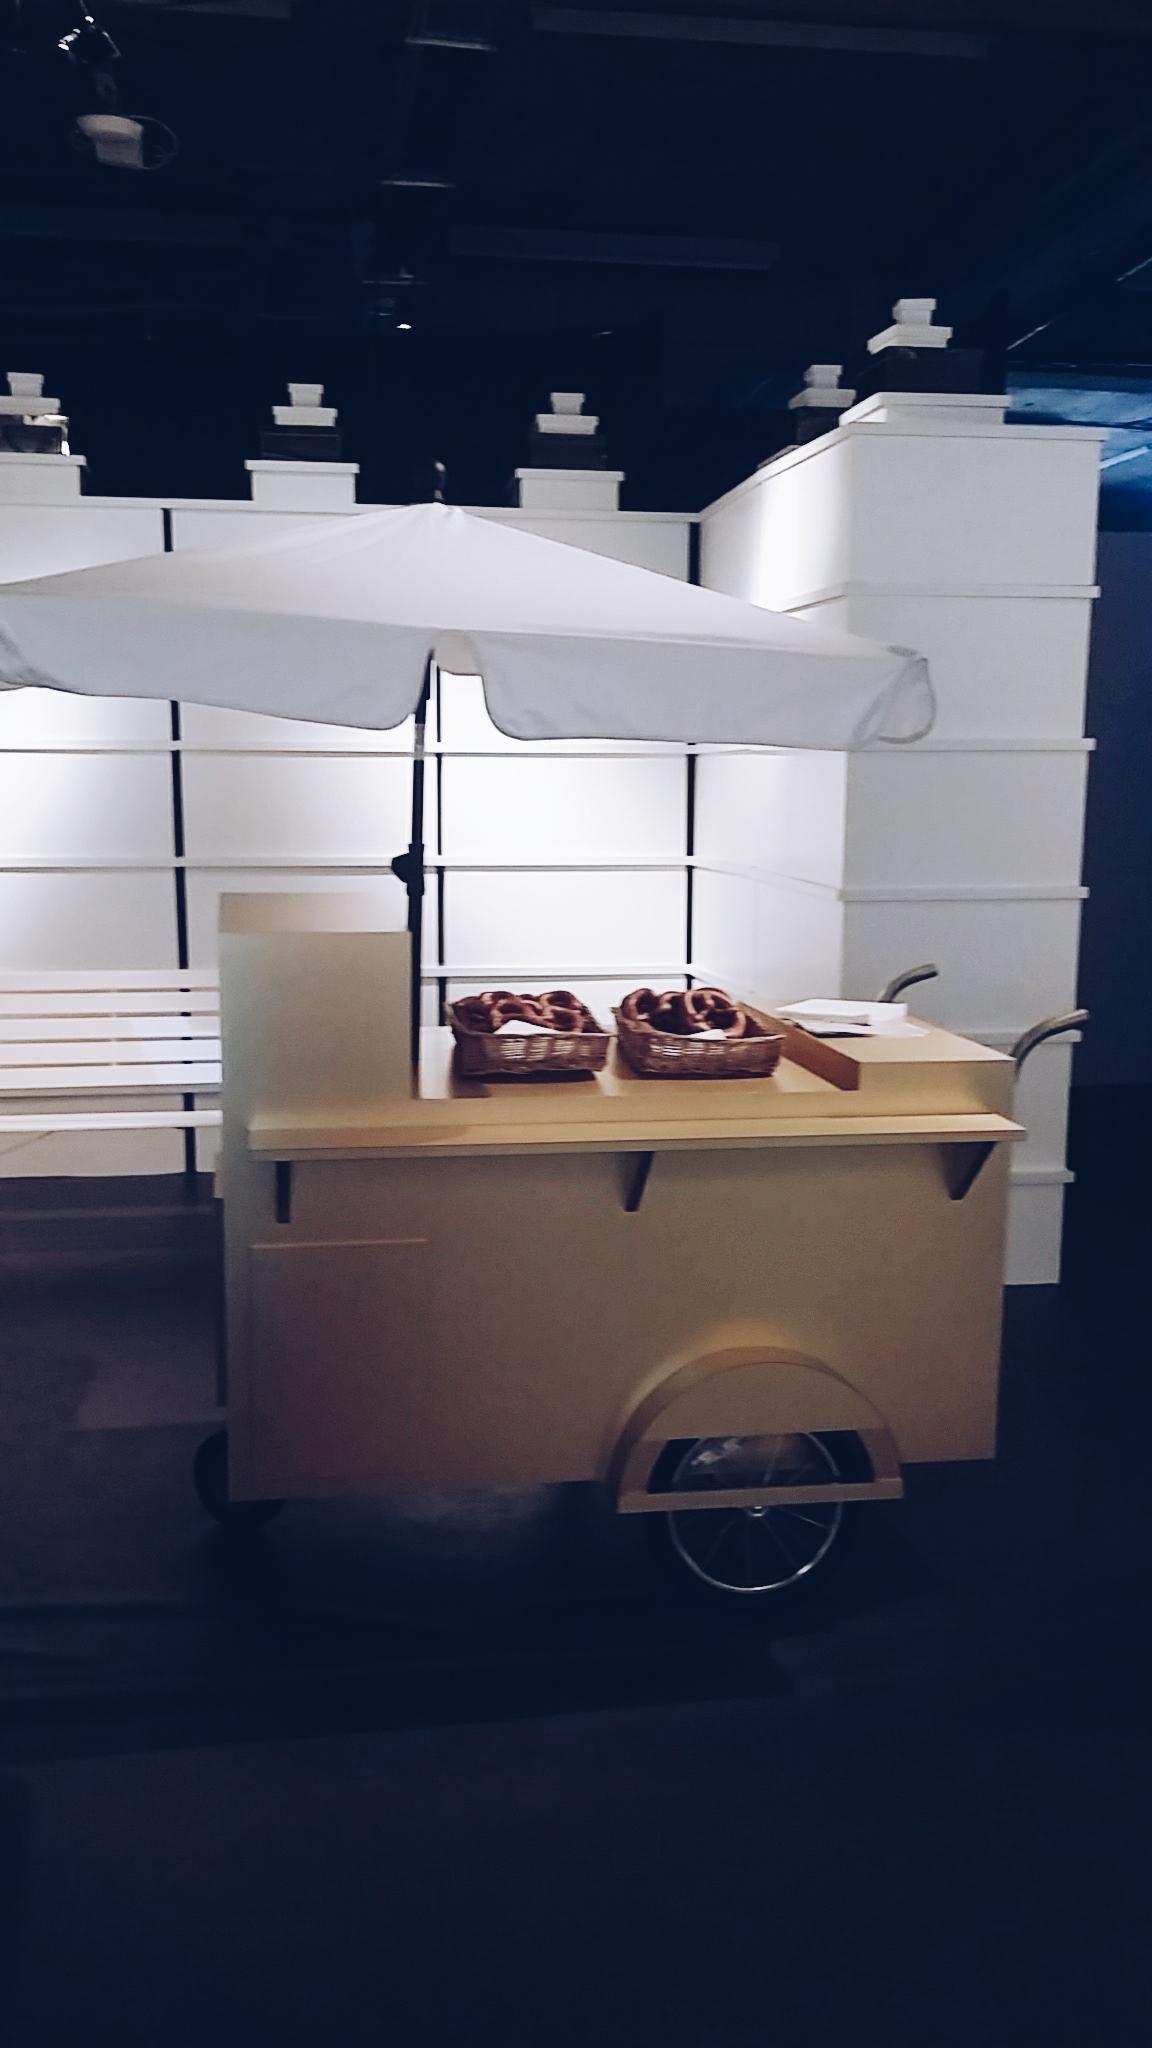 Tiffany & Co. Fifth & 57th installation at Selfridges